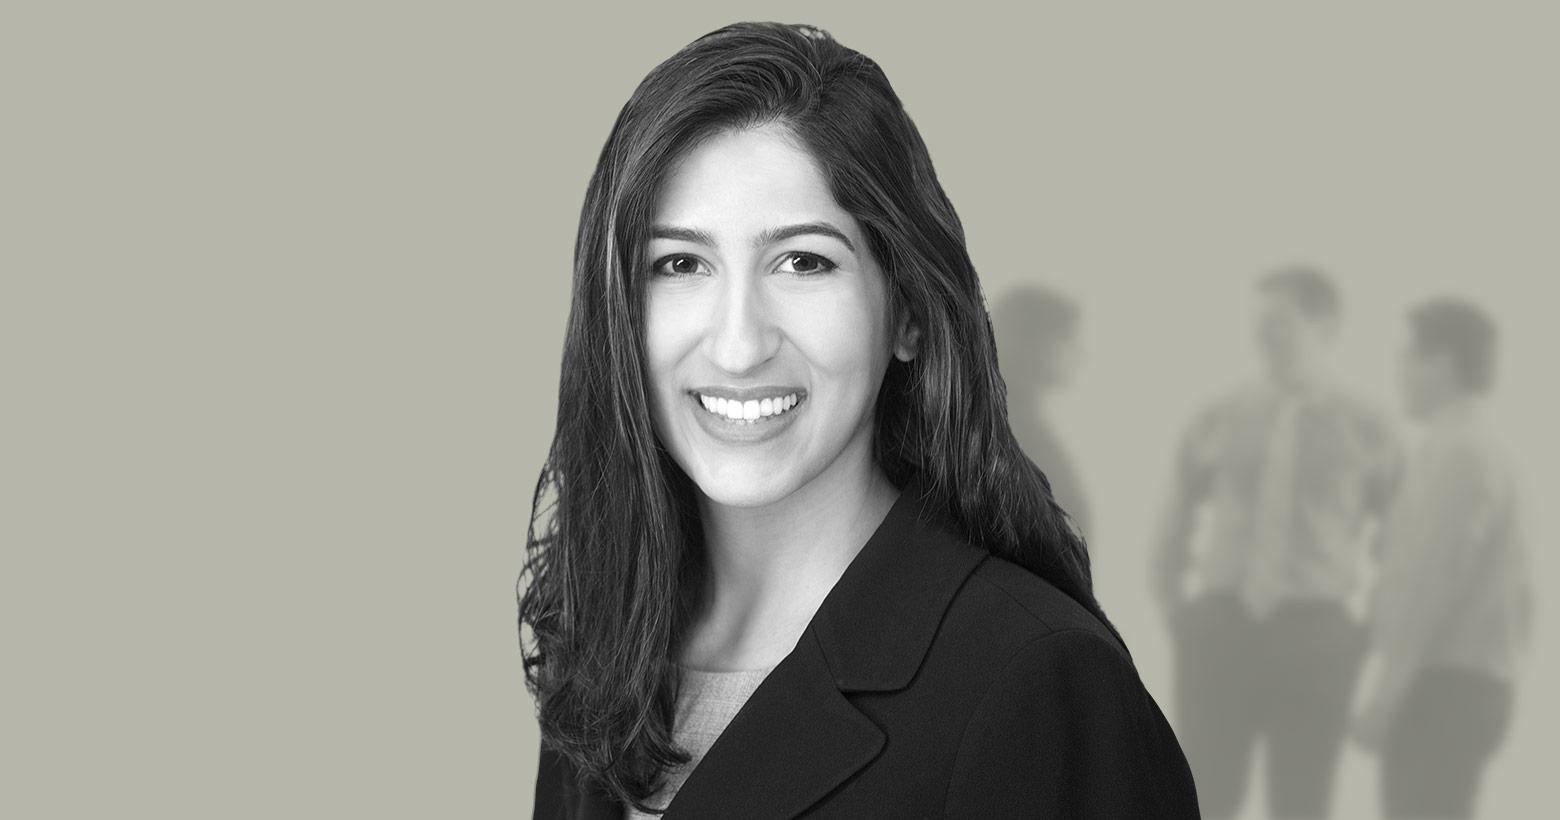 Catherine D. Maleki